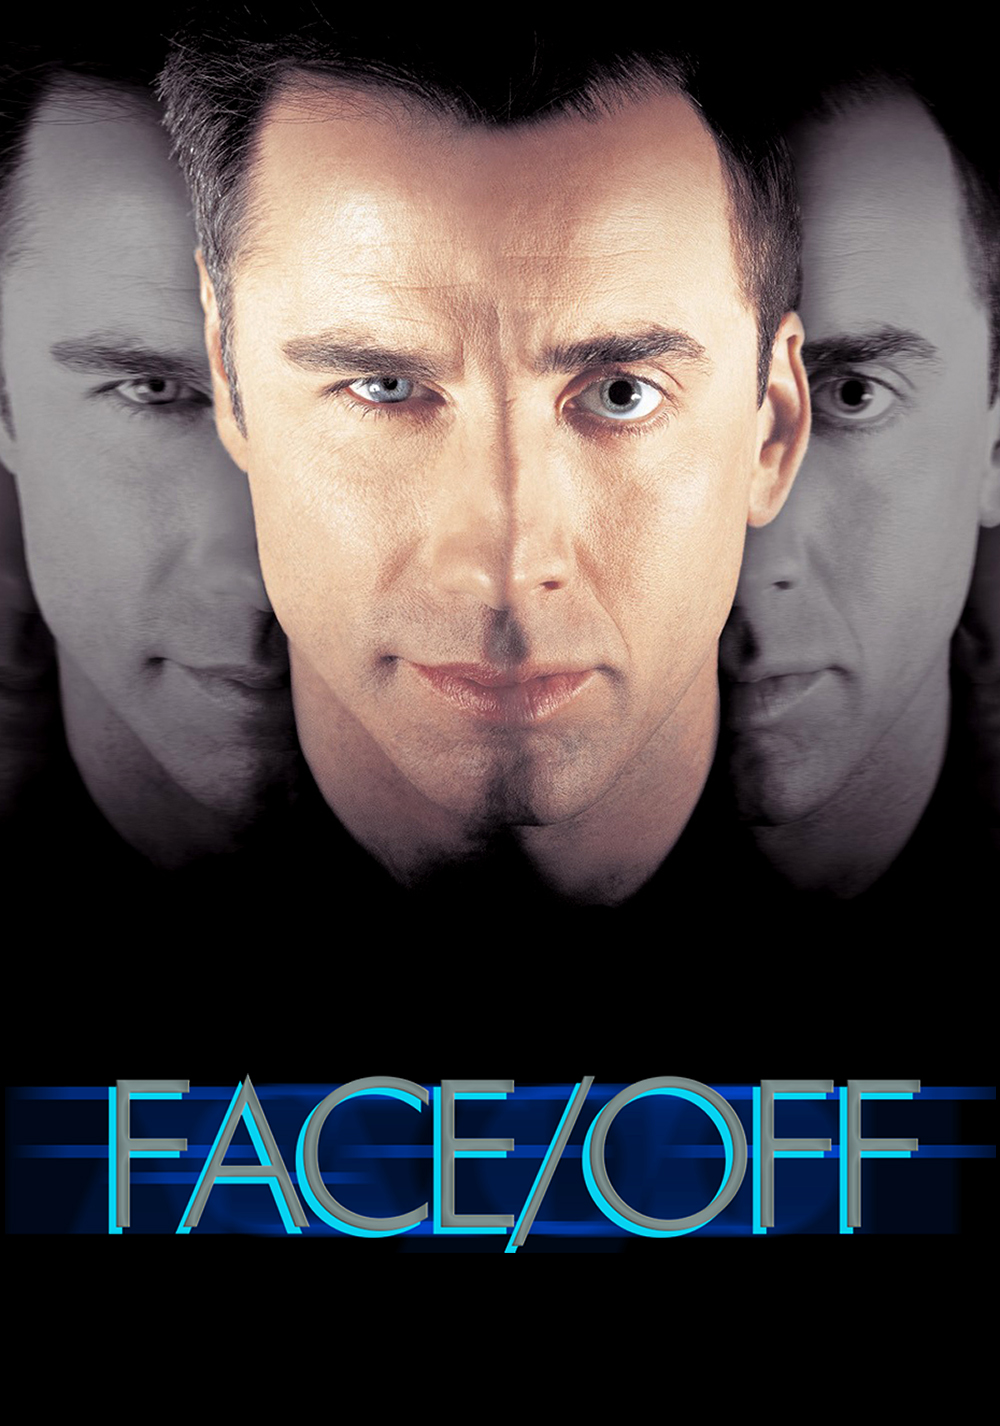 faceoff 1997 cinemorgue wiki fandom powered by wikia